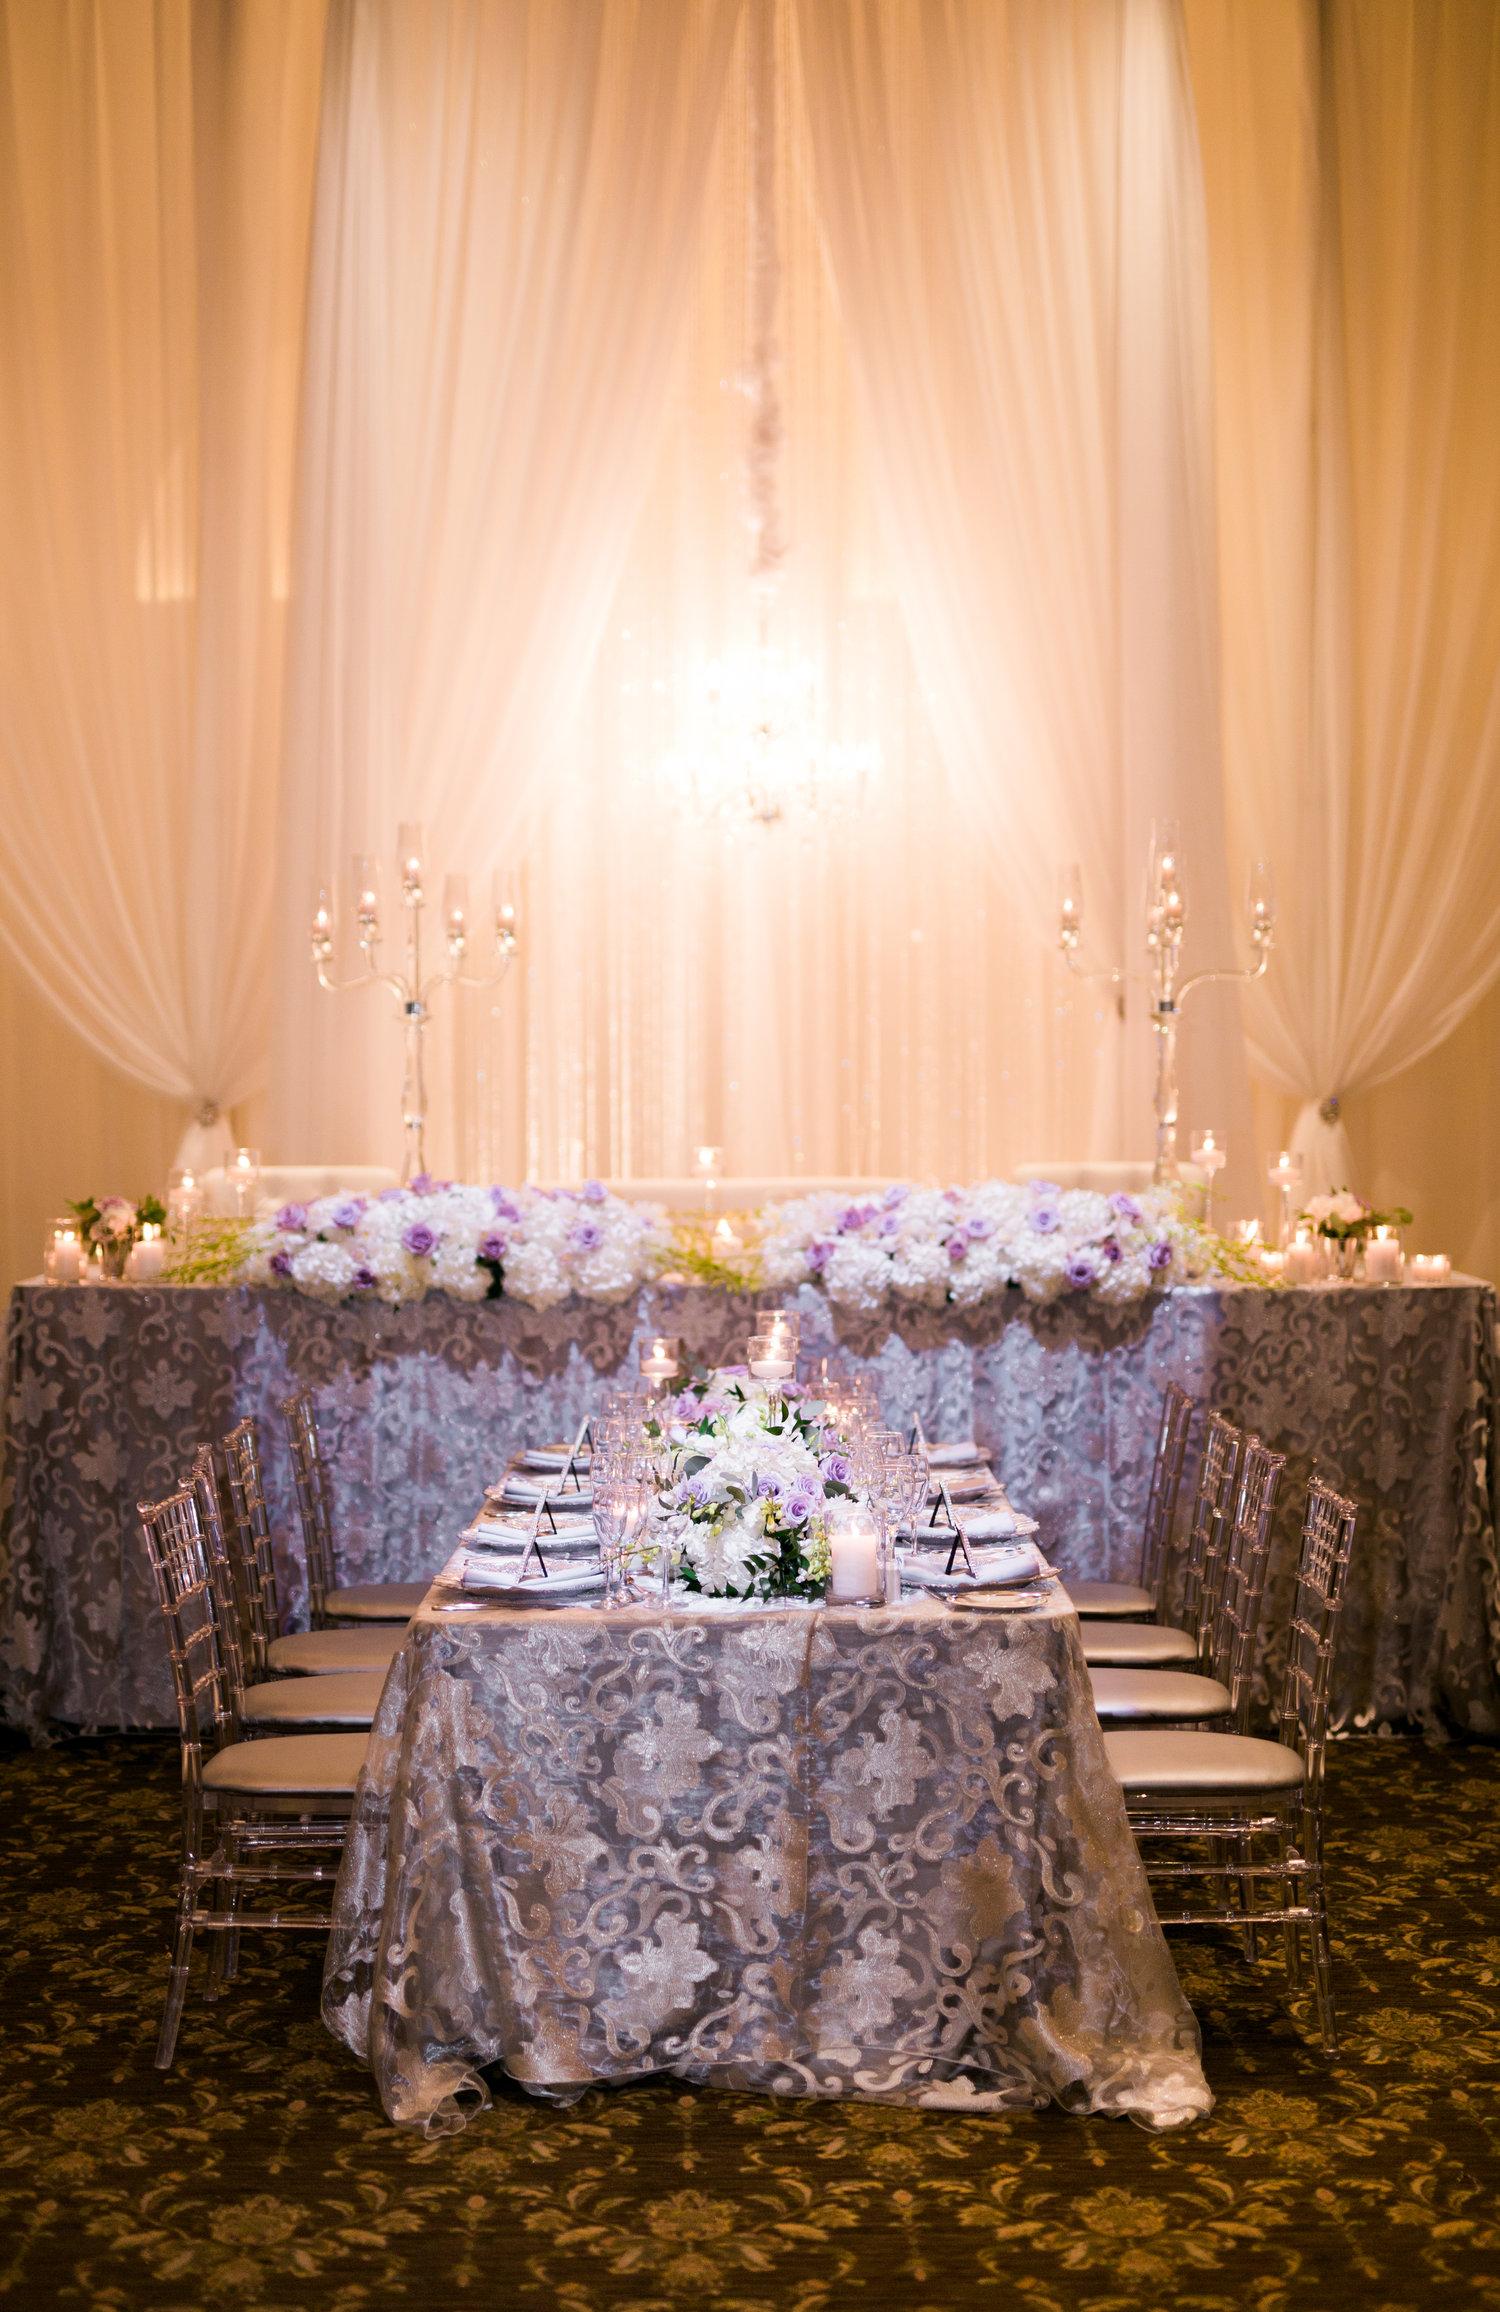 Danielle-Giroux-Amir-Golbazi-Toronto-Wedding-Photographer-Bellvue-Manor_DeLuca_2-9.jpg